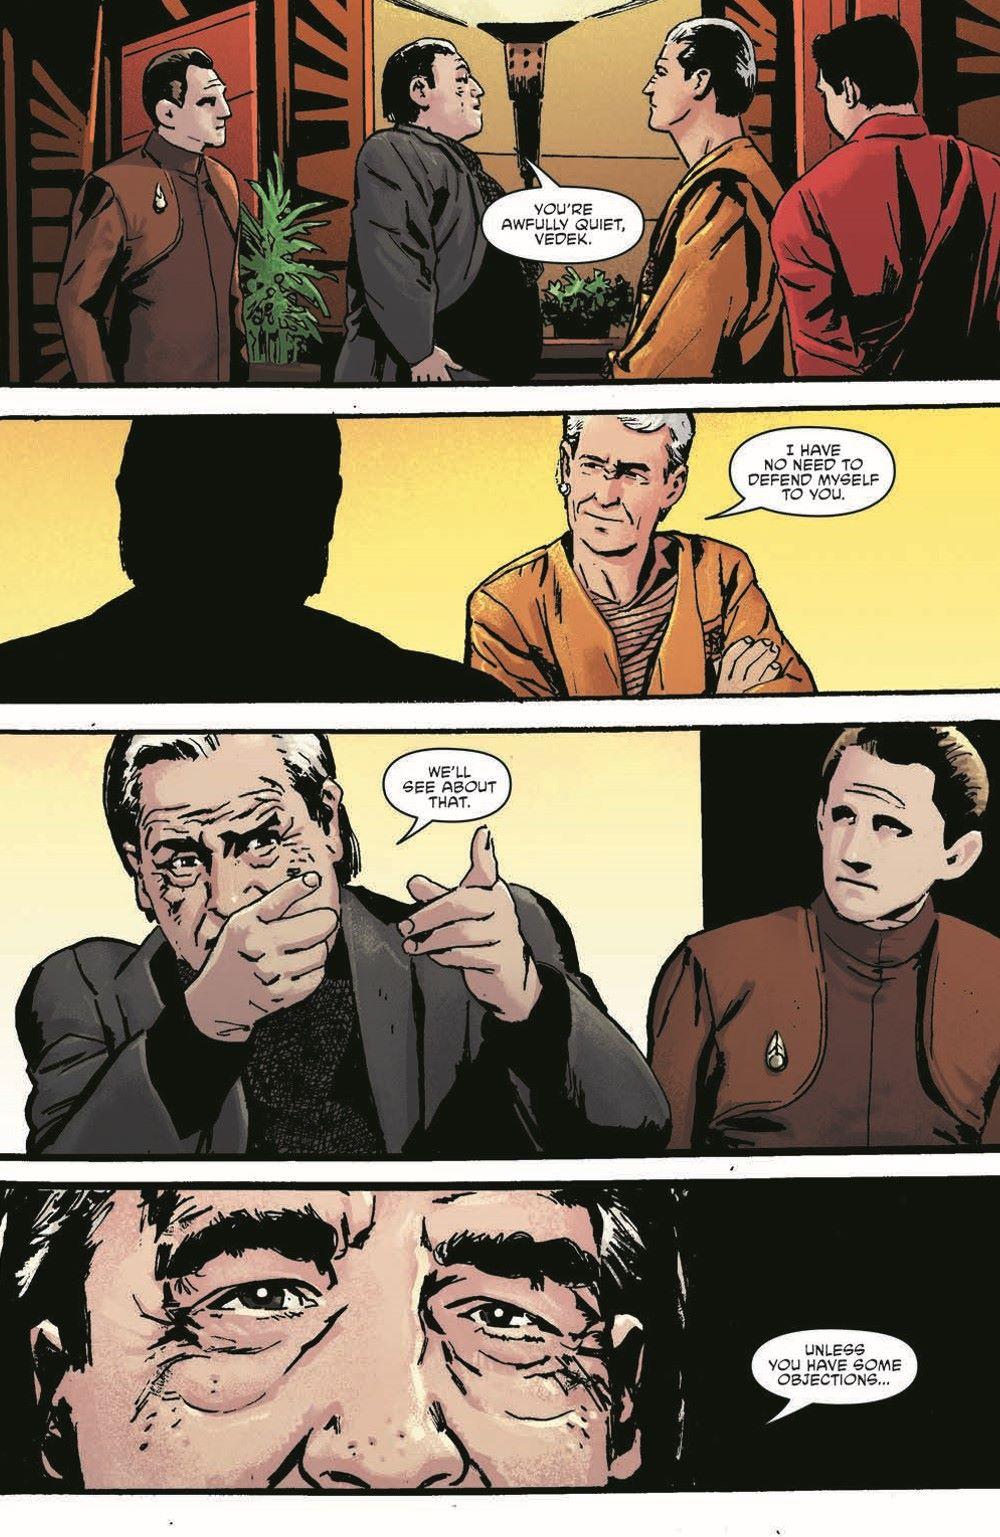 ST_DS9_04-pr-3 ComicList Previews: STAR TREK DEEP SPACE NINE TOO LONG A SACRIFICE #4 (OF 4)